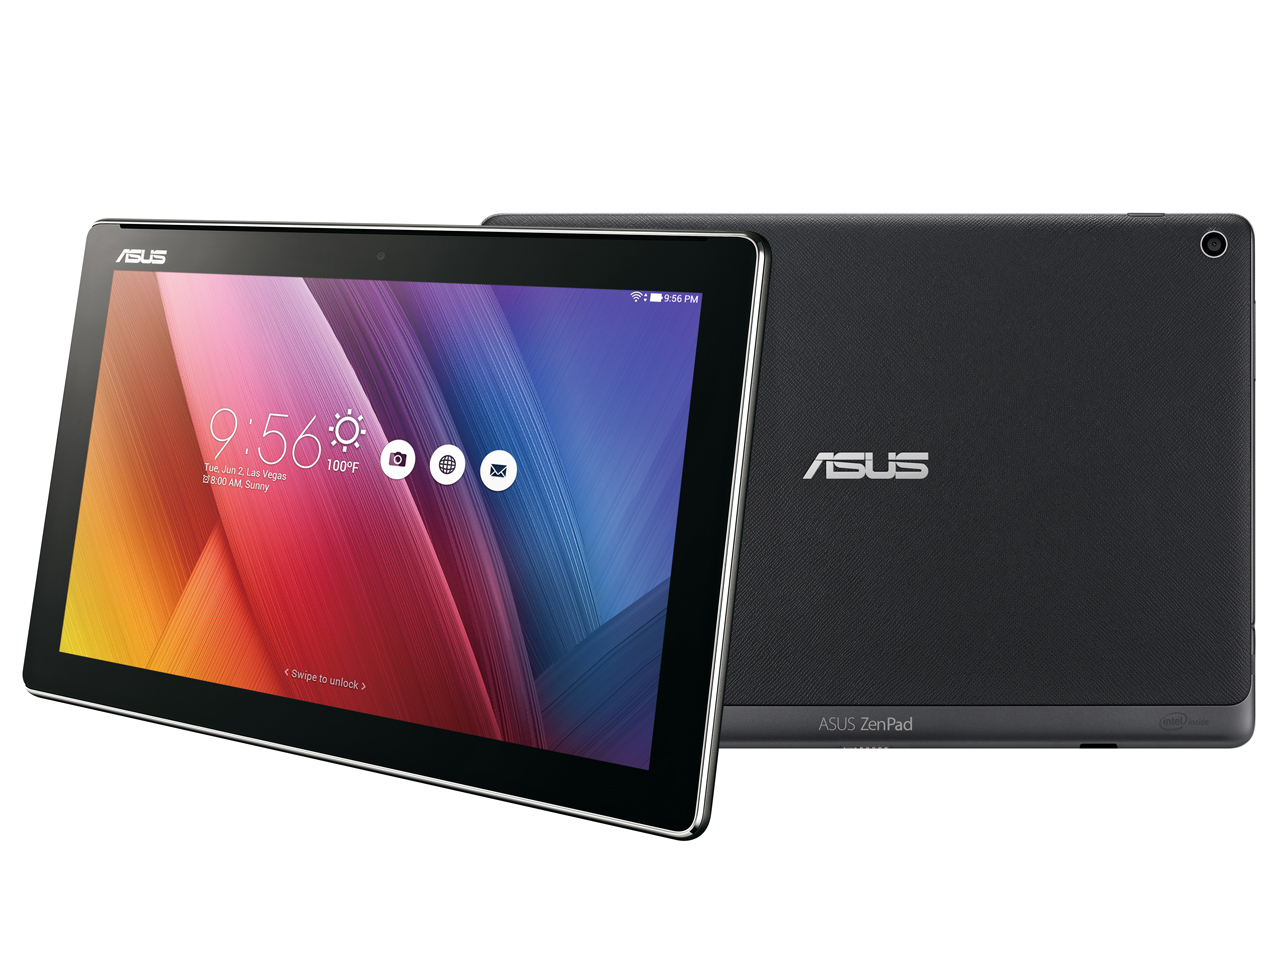 ASUS ZenPad 10 Z300C-BK16 [ブラック] の製品画像